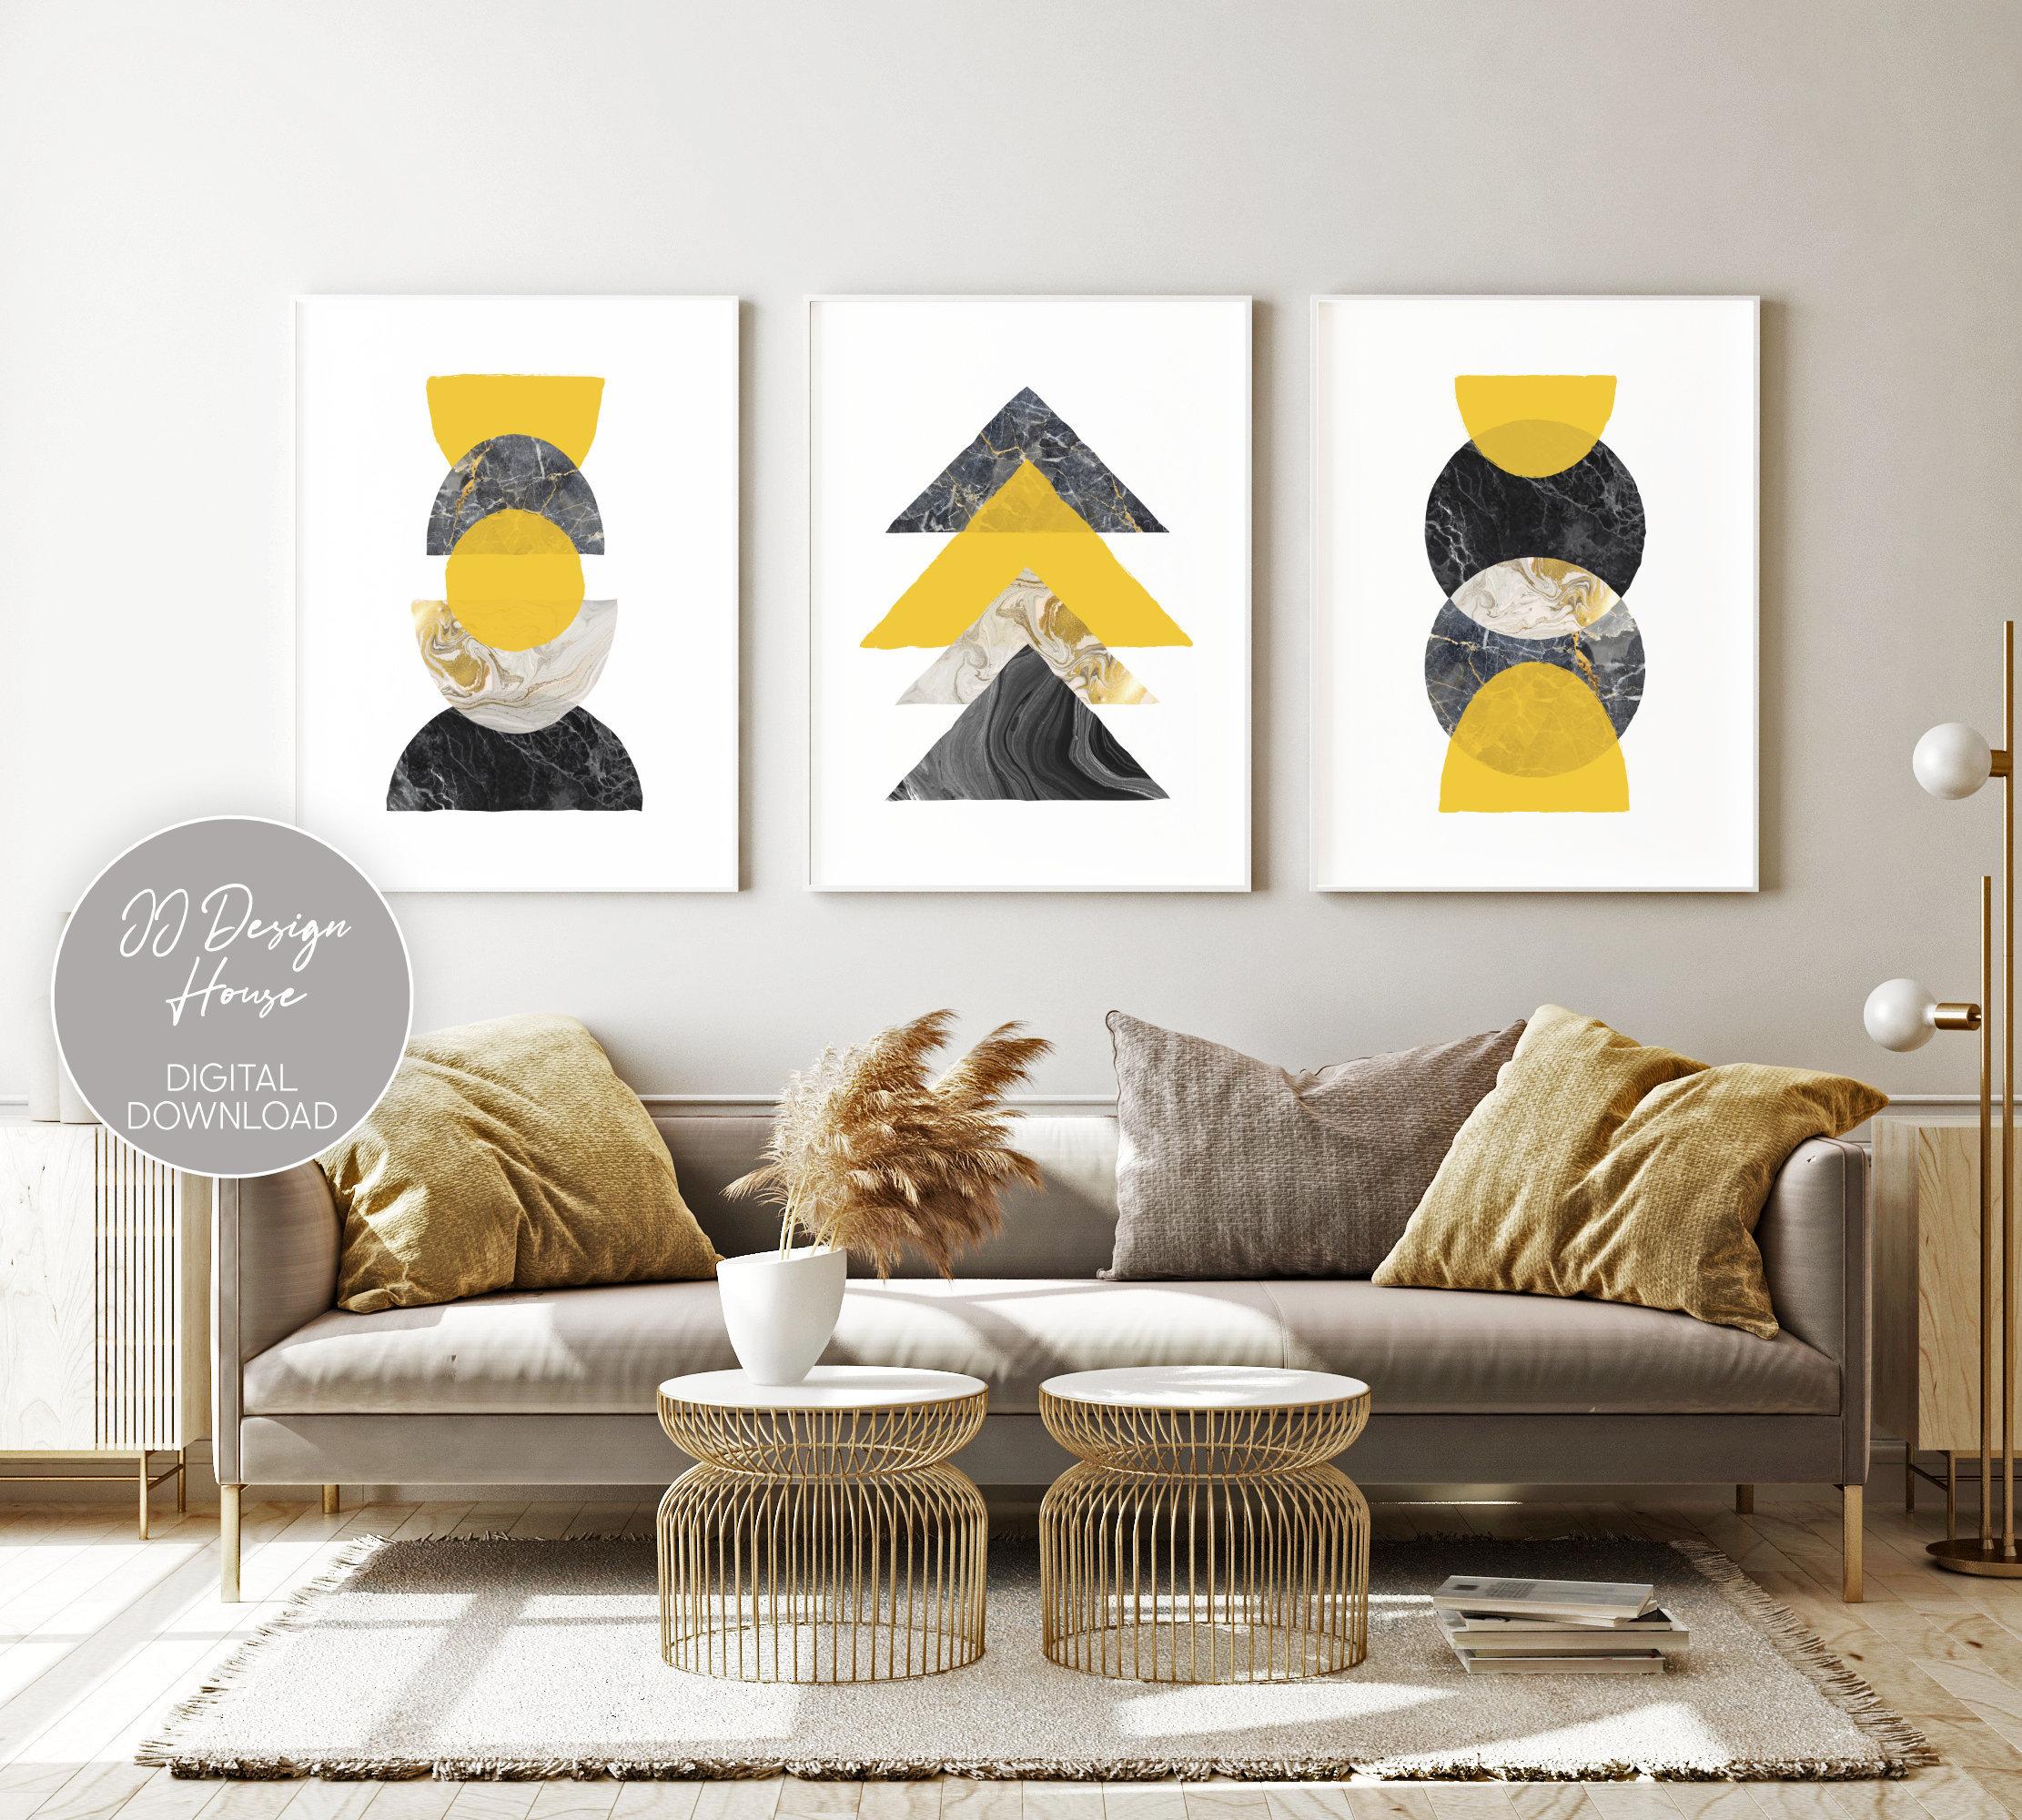 Yellow Chair Living Room Wall Art Living Room Wall Decor Fine Art Print Mary Julia Craft Shadows and Light